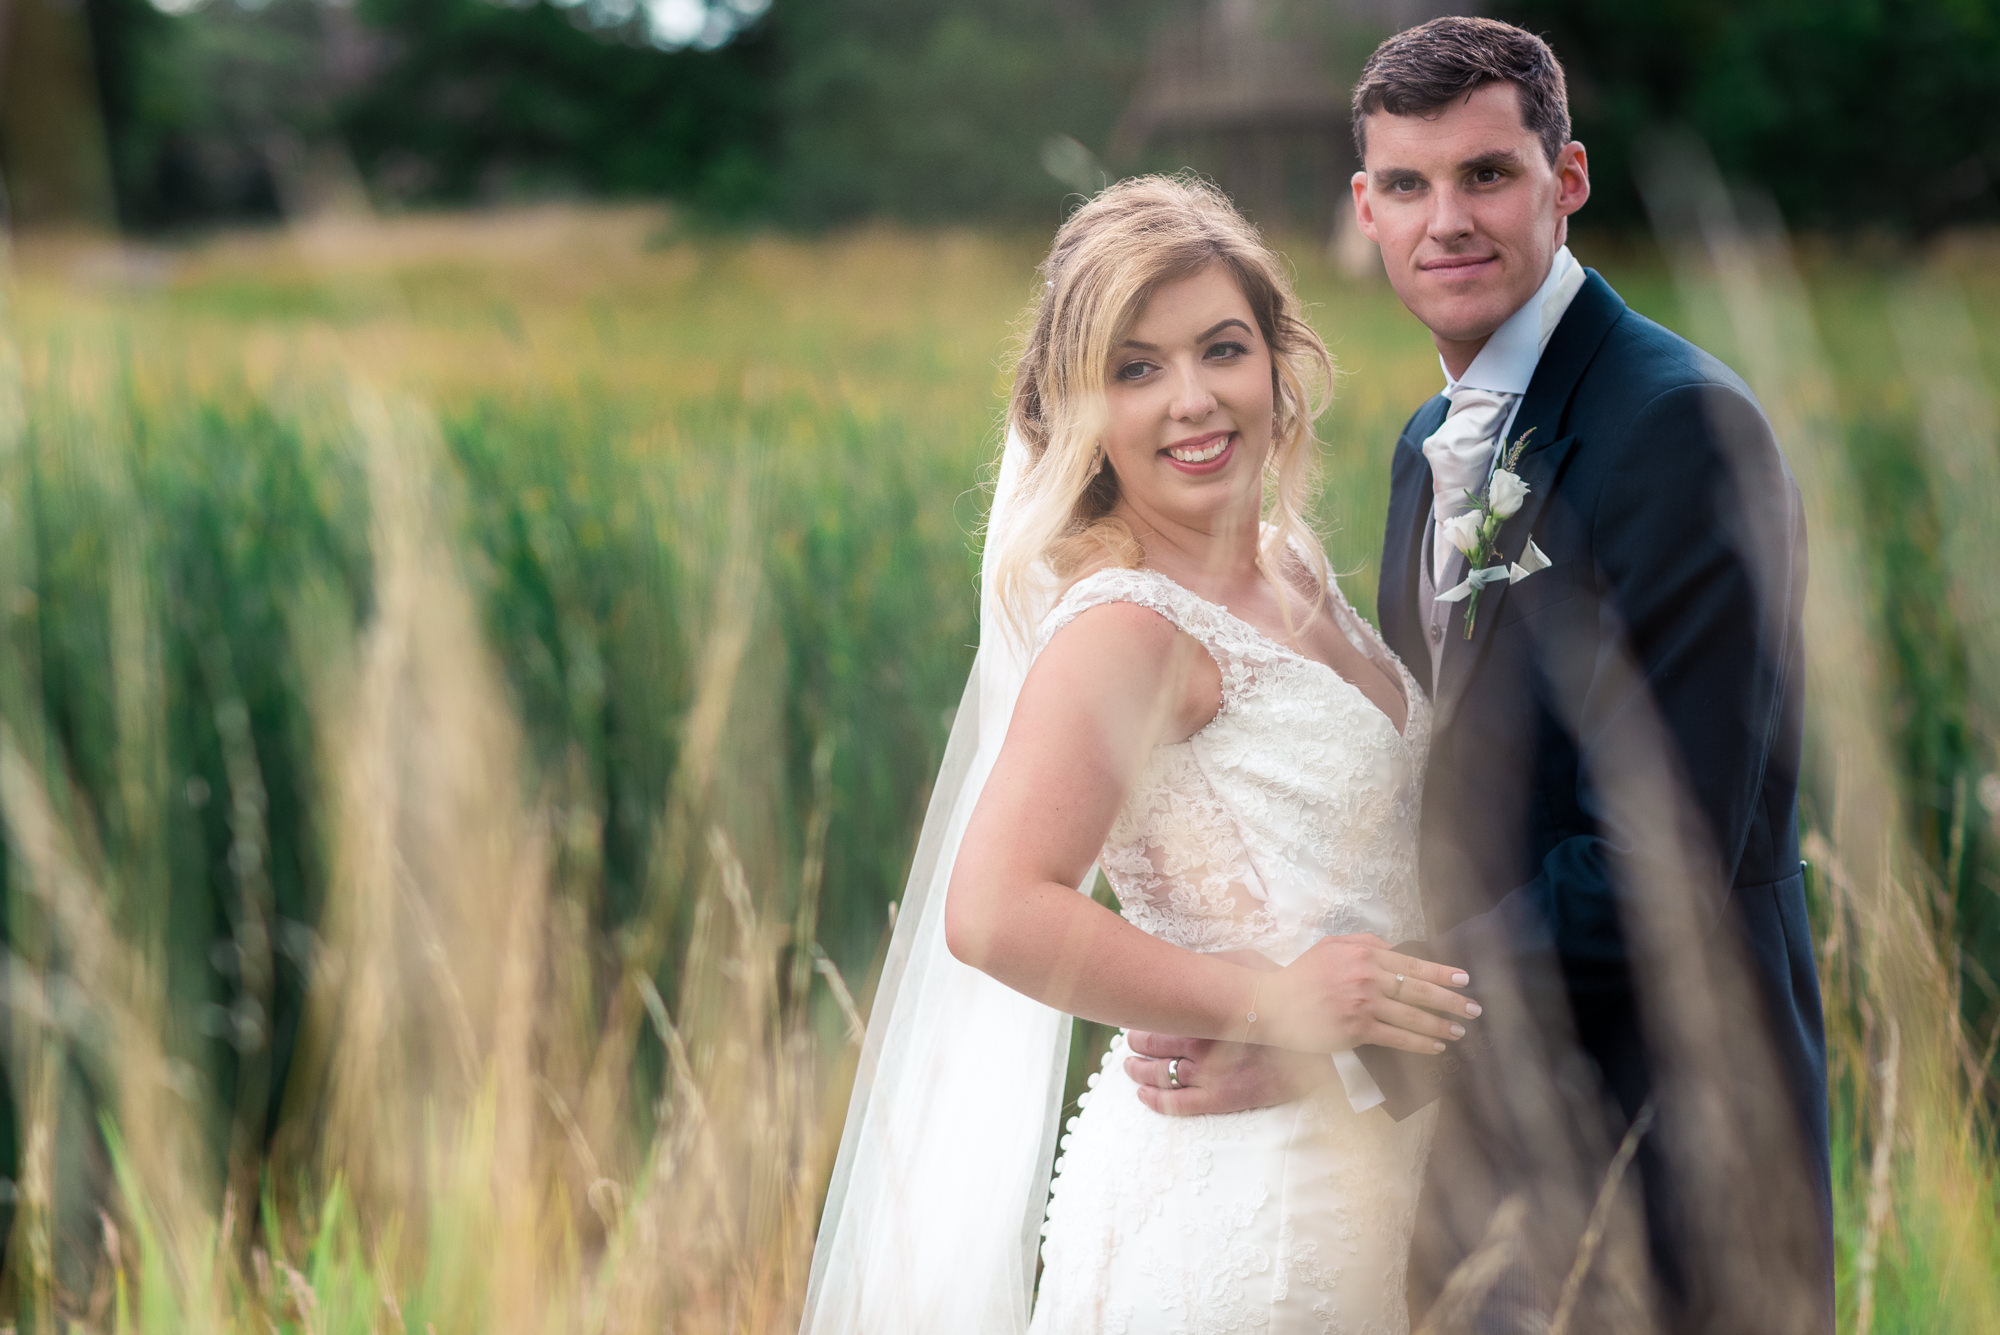 narborough hall gardens wedding photography-63 copy.jpg